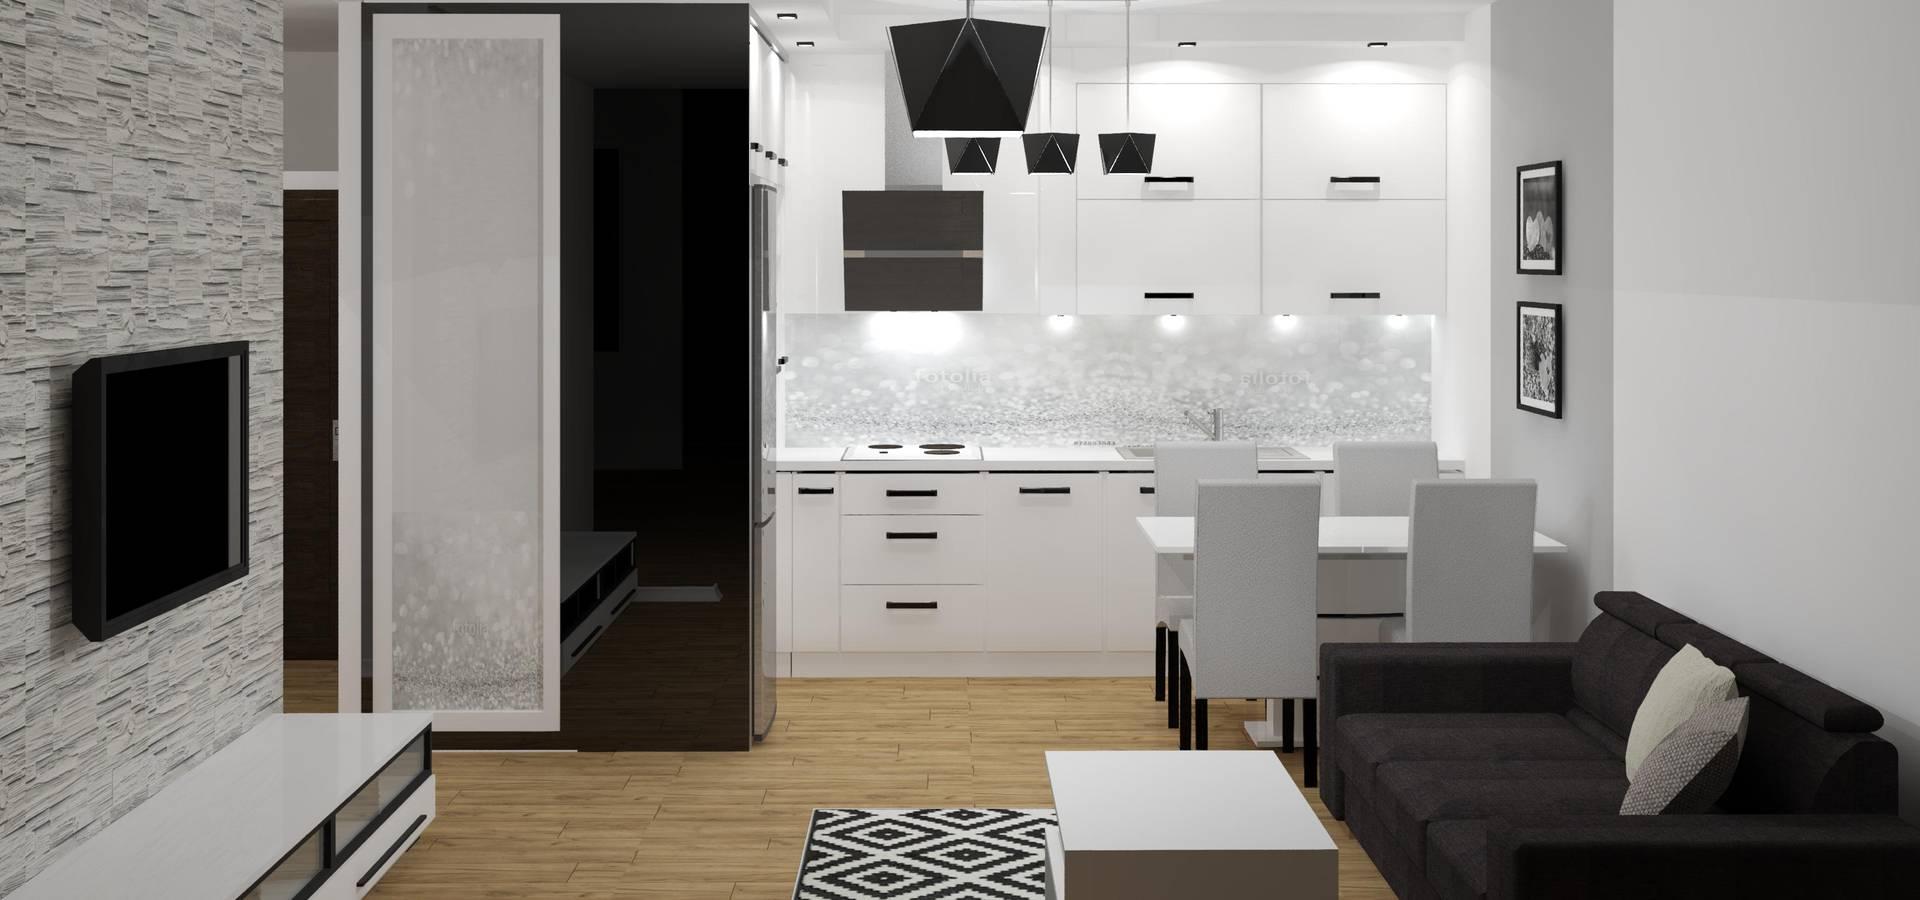 3D Interior Studio Projektowania Wnętrz